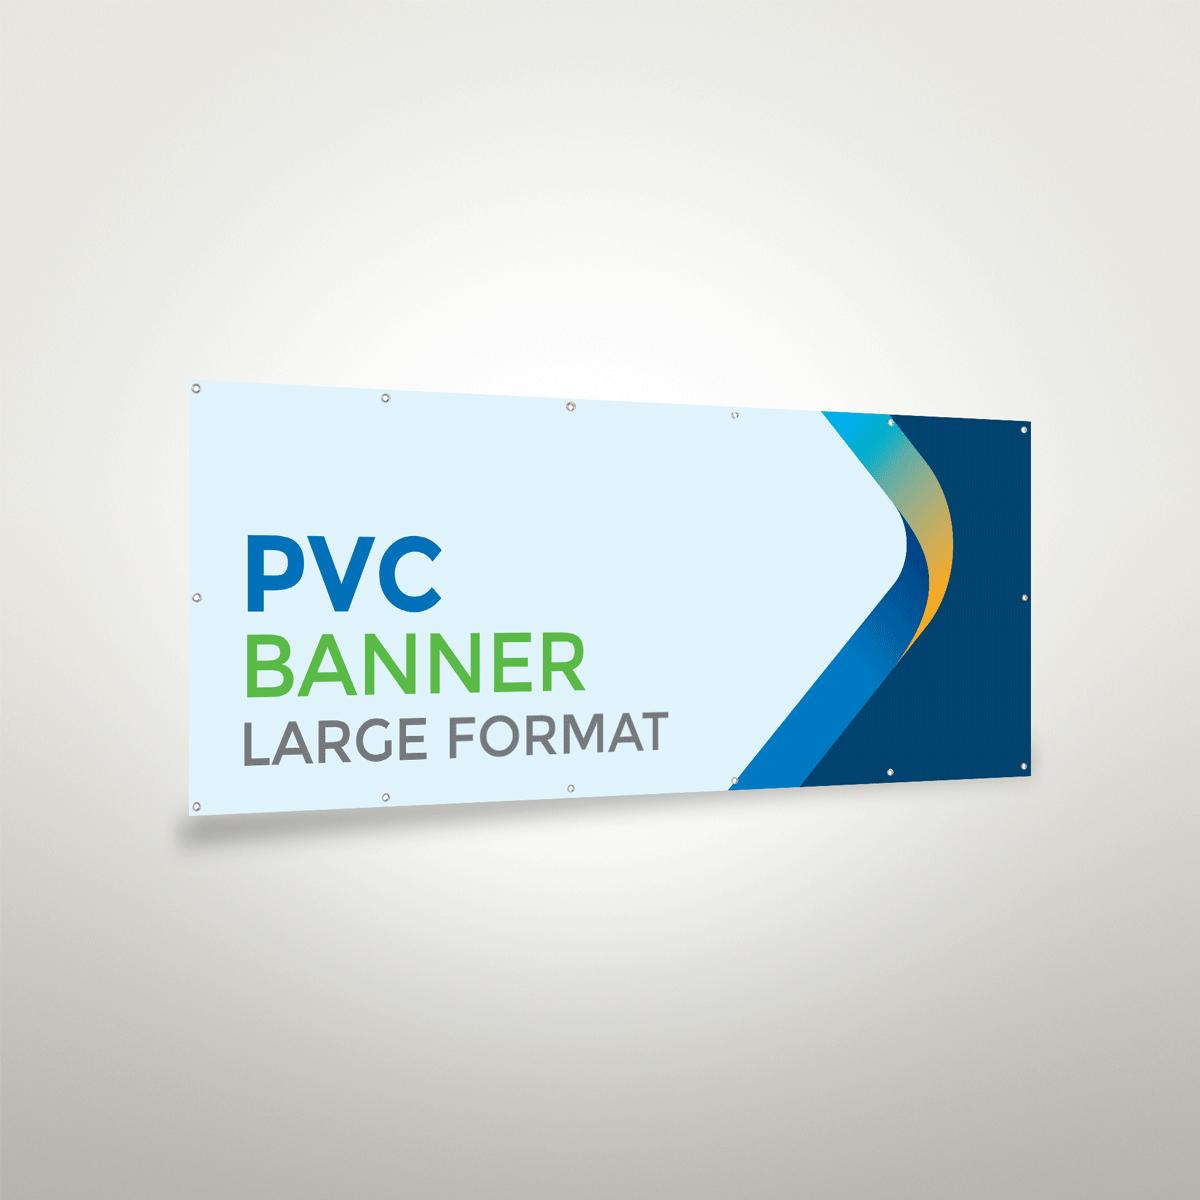 Pvc banners london personalised banners ez printers cheapinstantlastminutequalitypvclargeformatexhibitionbannerdisplaybackgroundprintingshopinlondonshoreditchlocale1 reheart Image collections